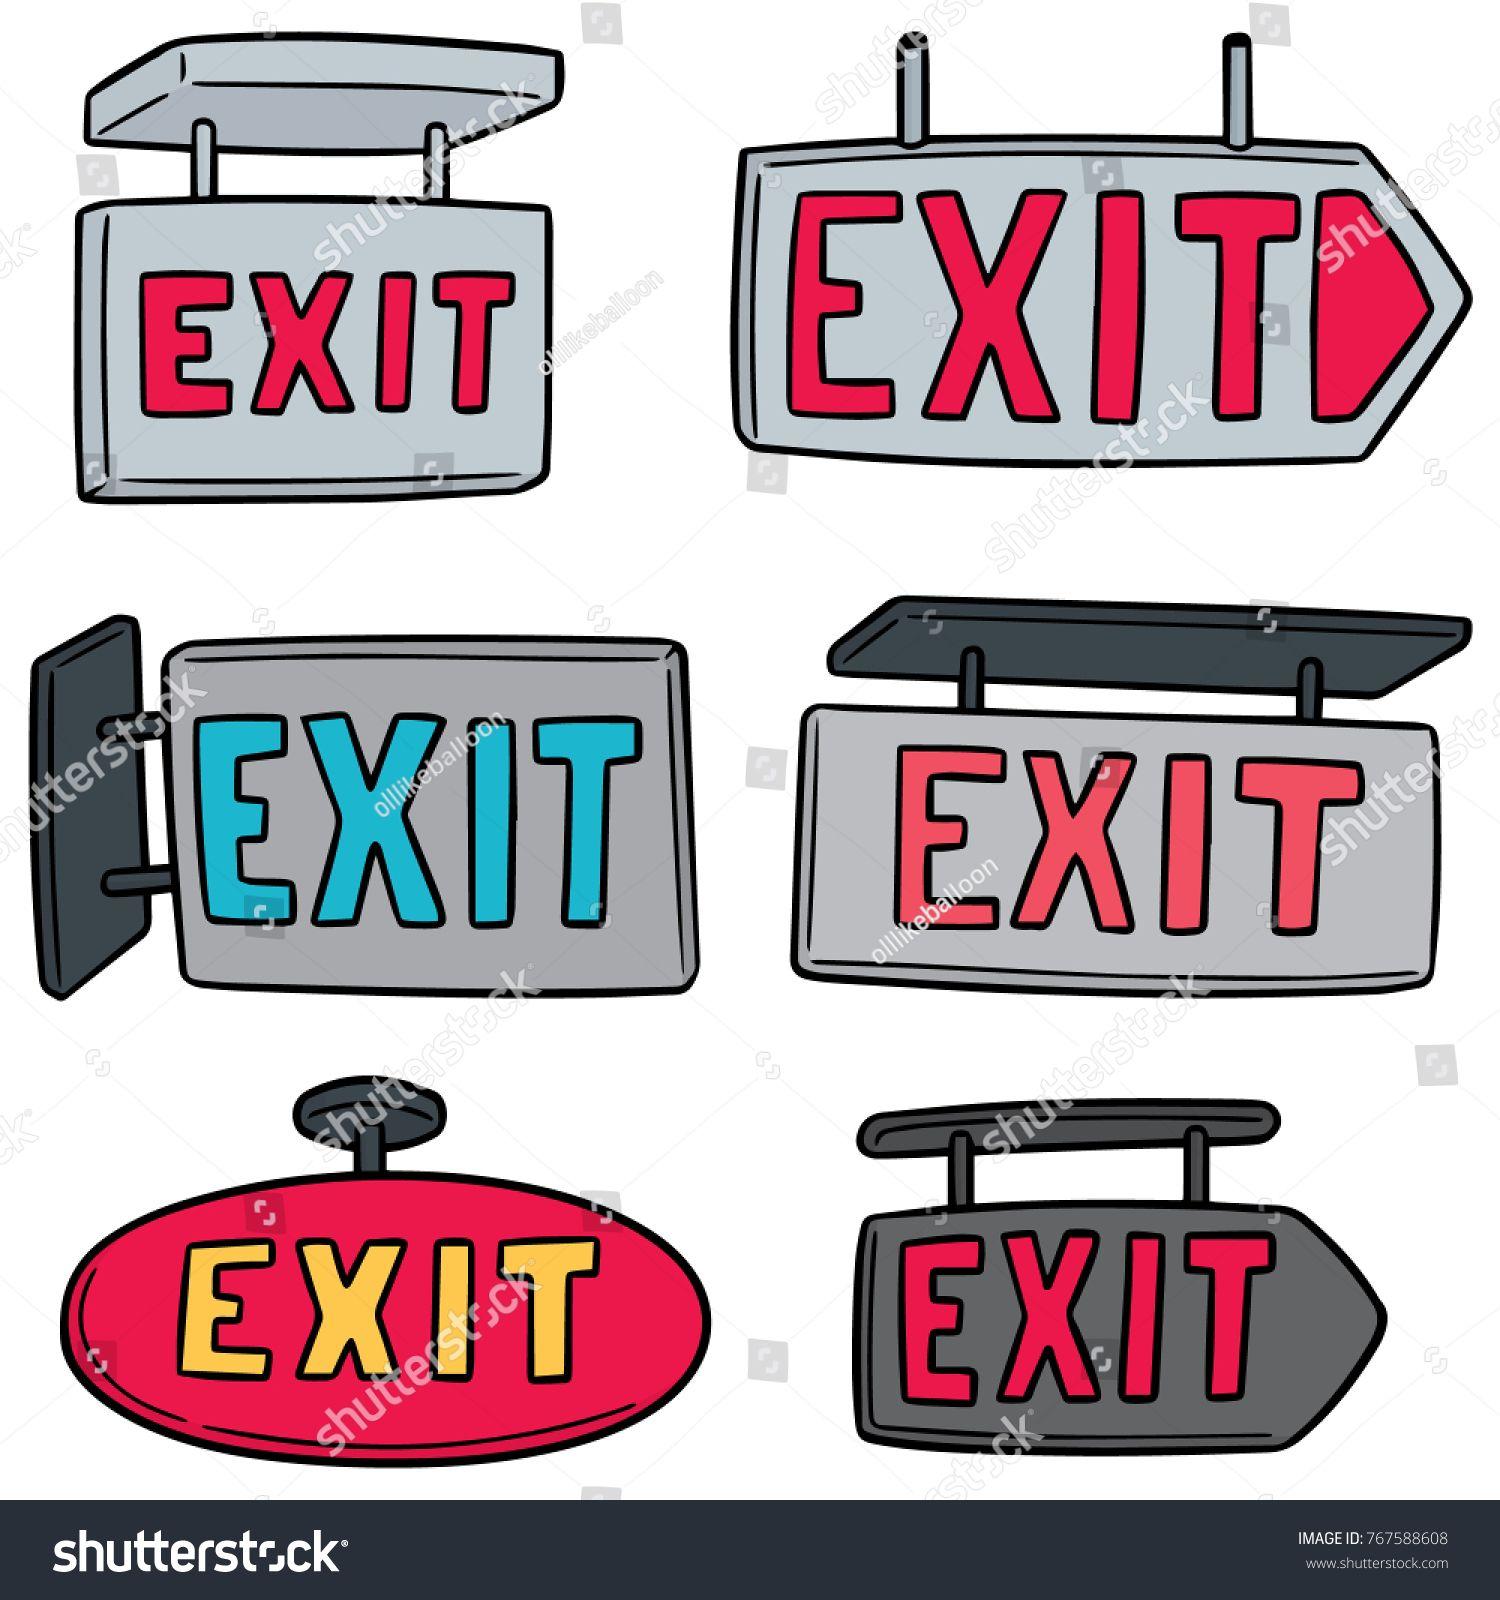 vector set of exit sign | Exit sign, Exit, Doodle illustration